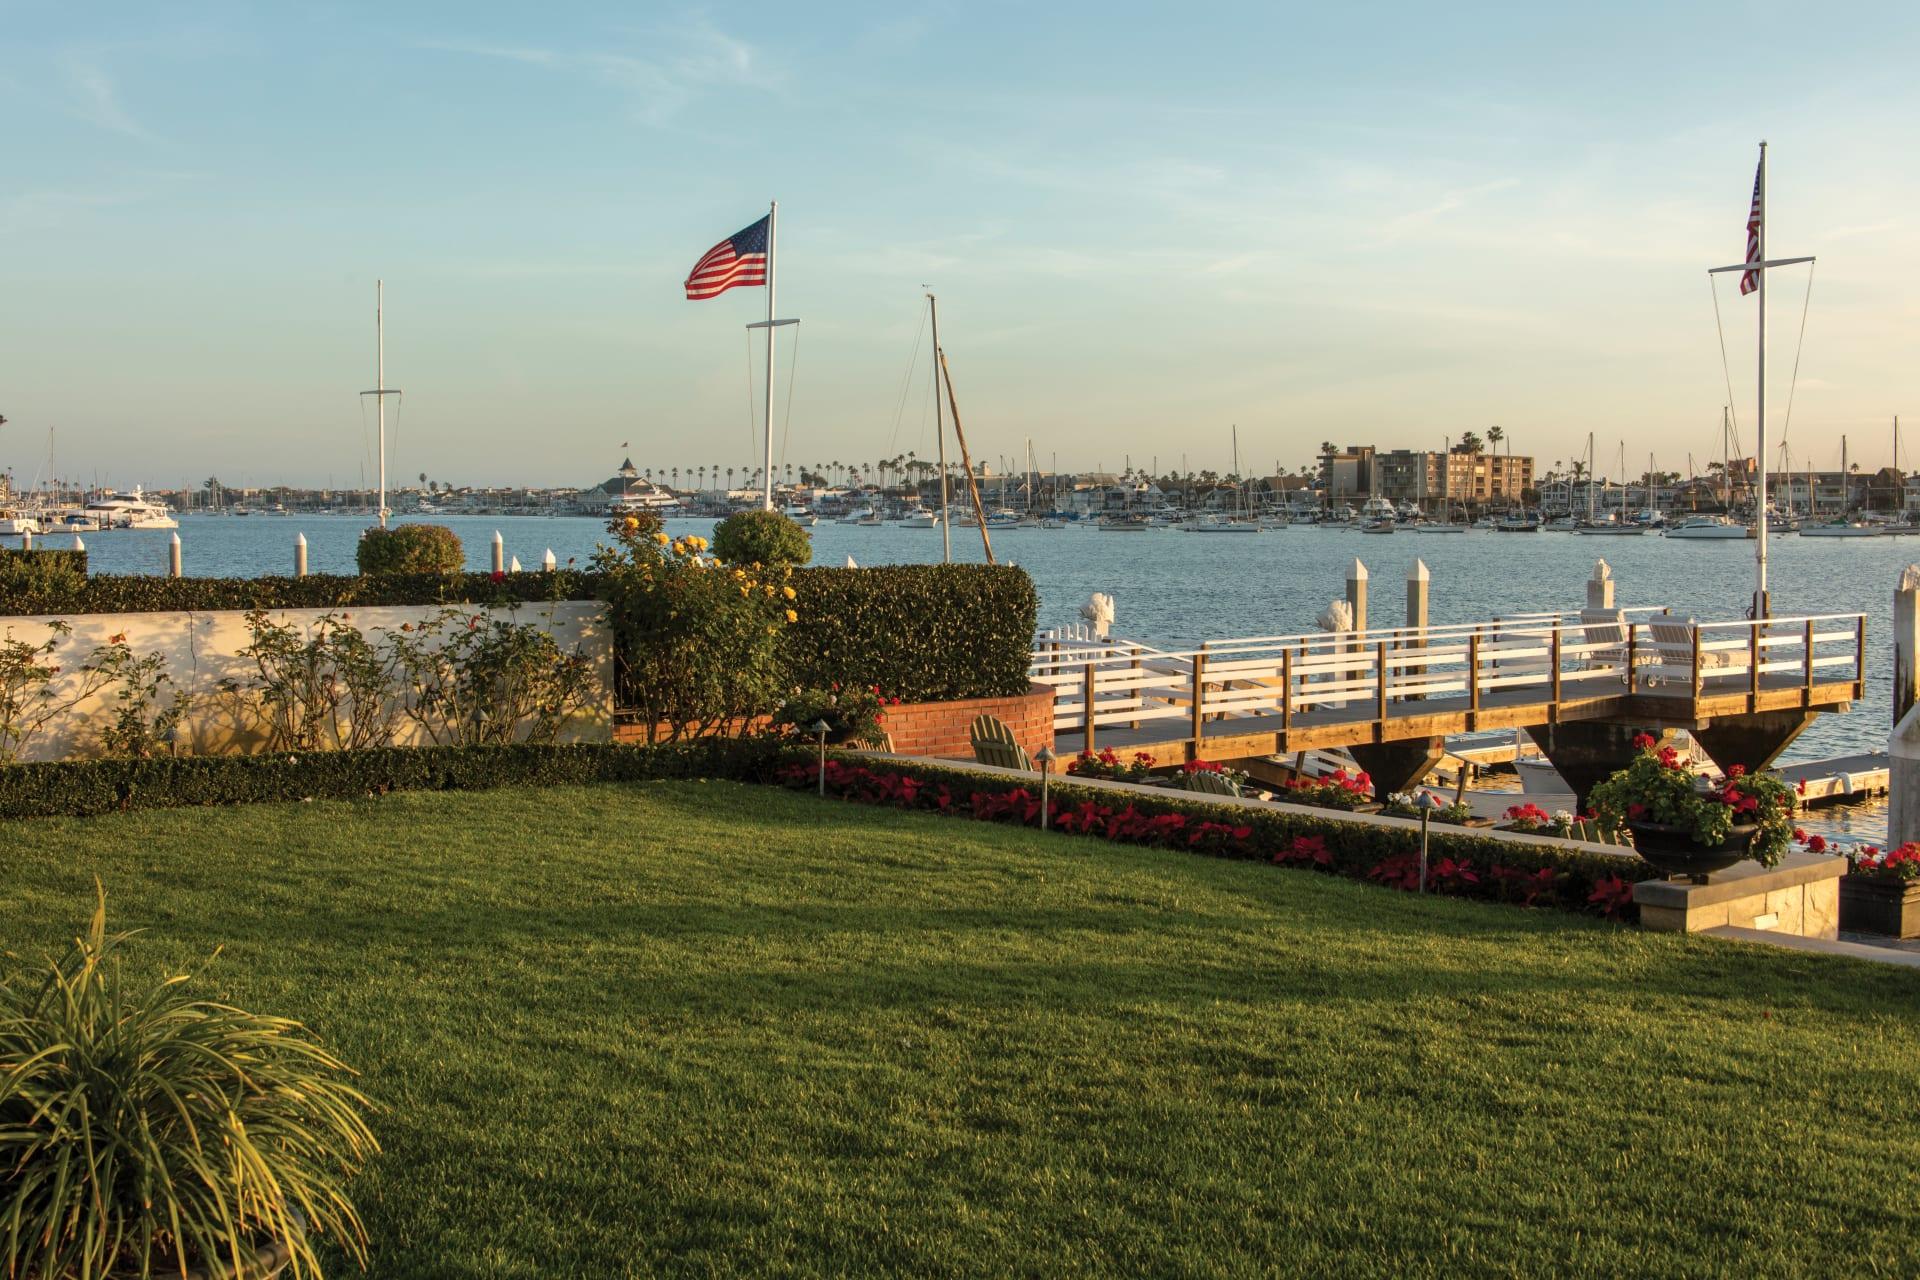 26 Harbor Island photo